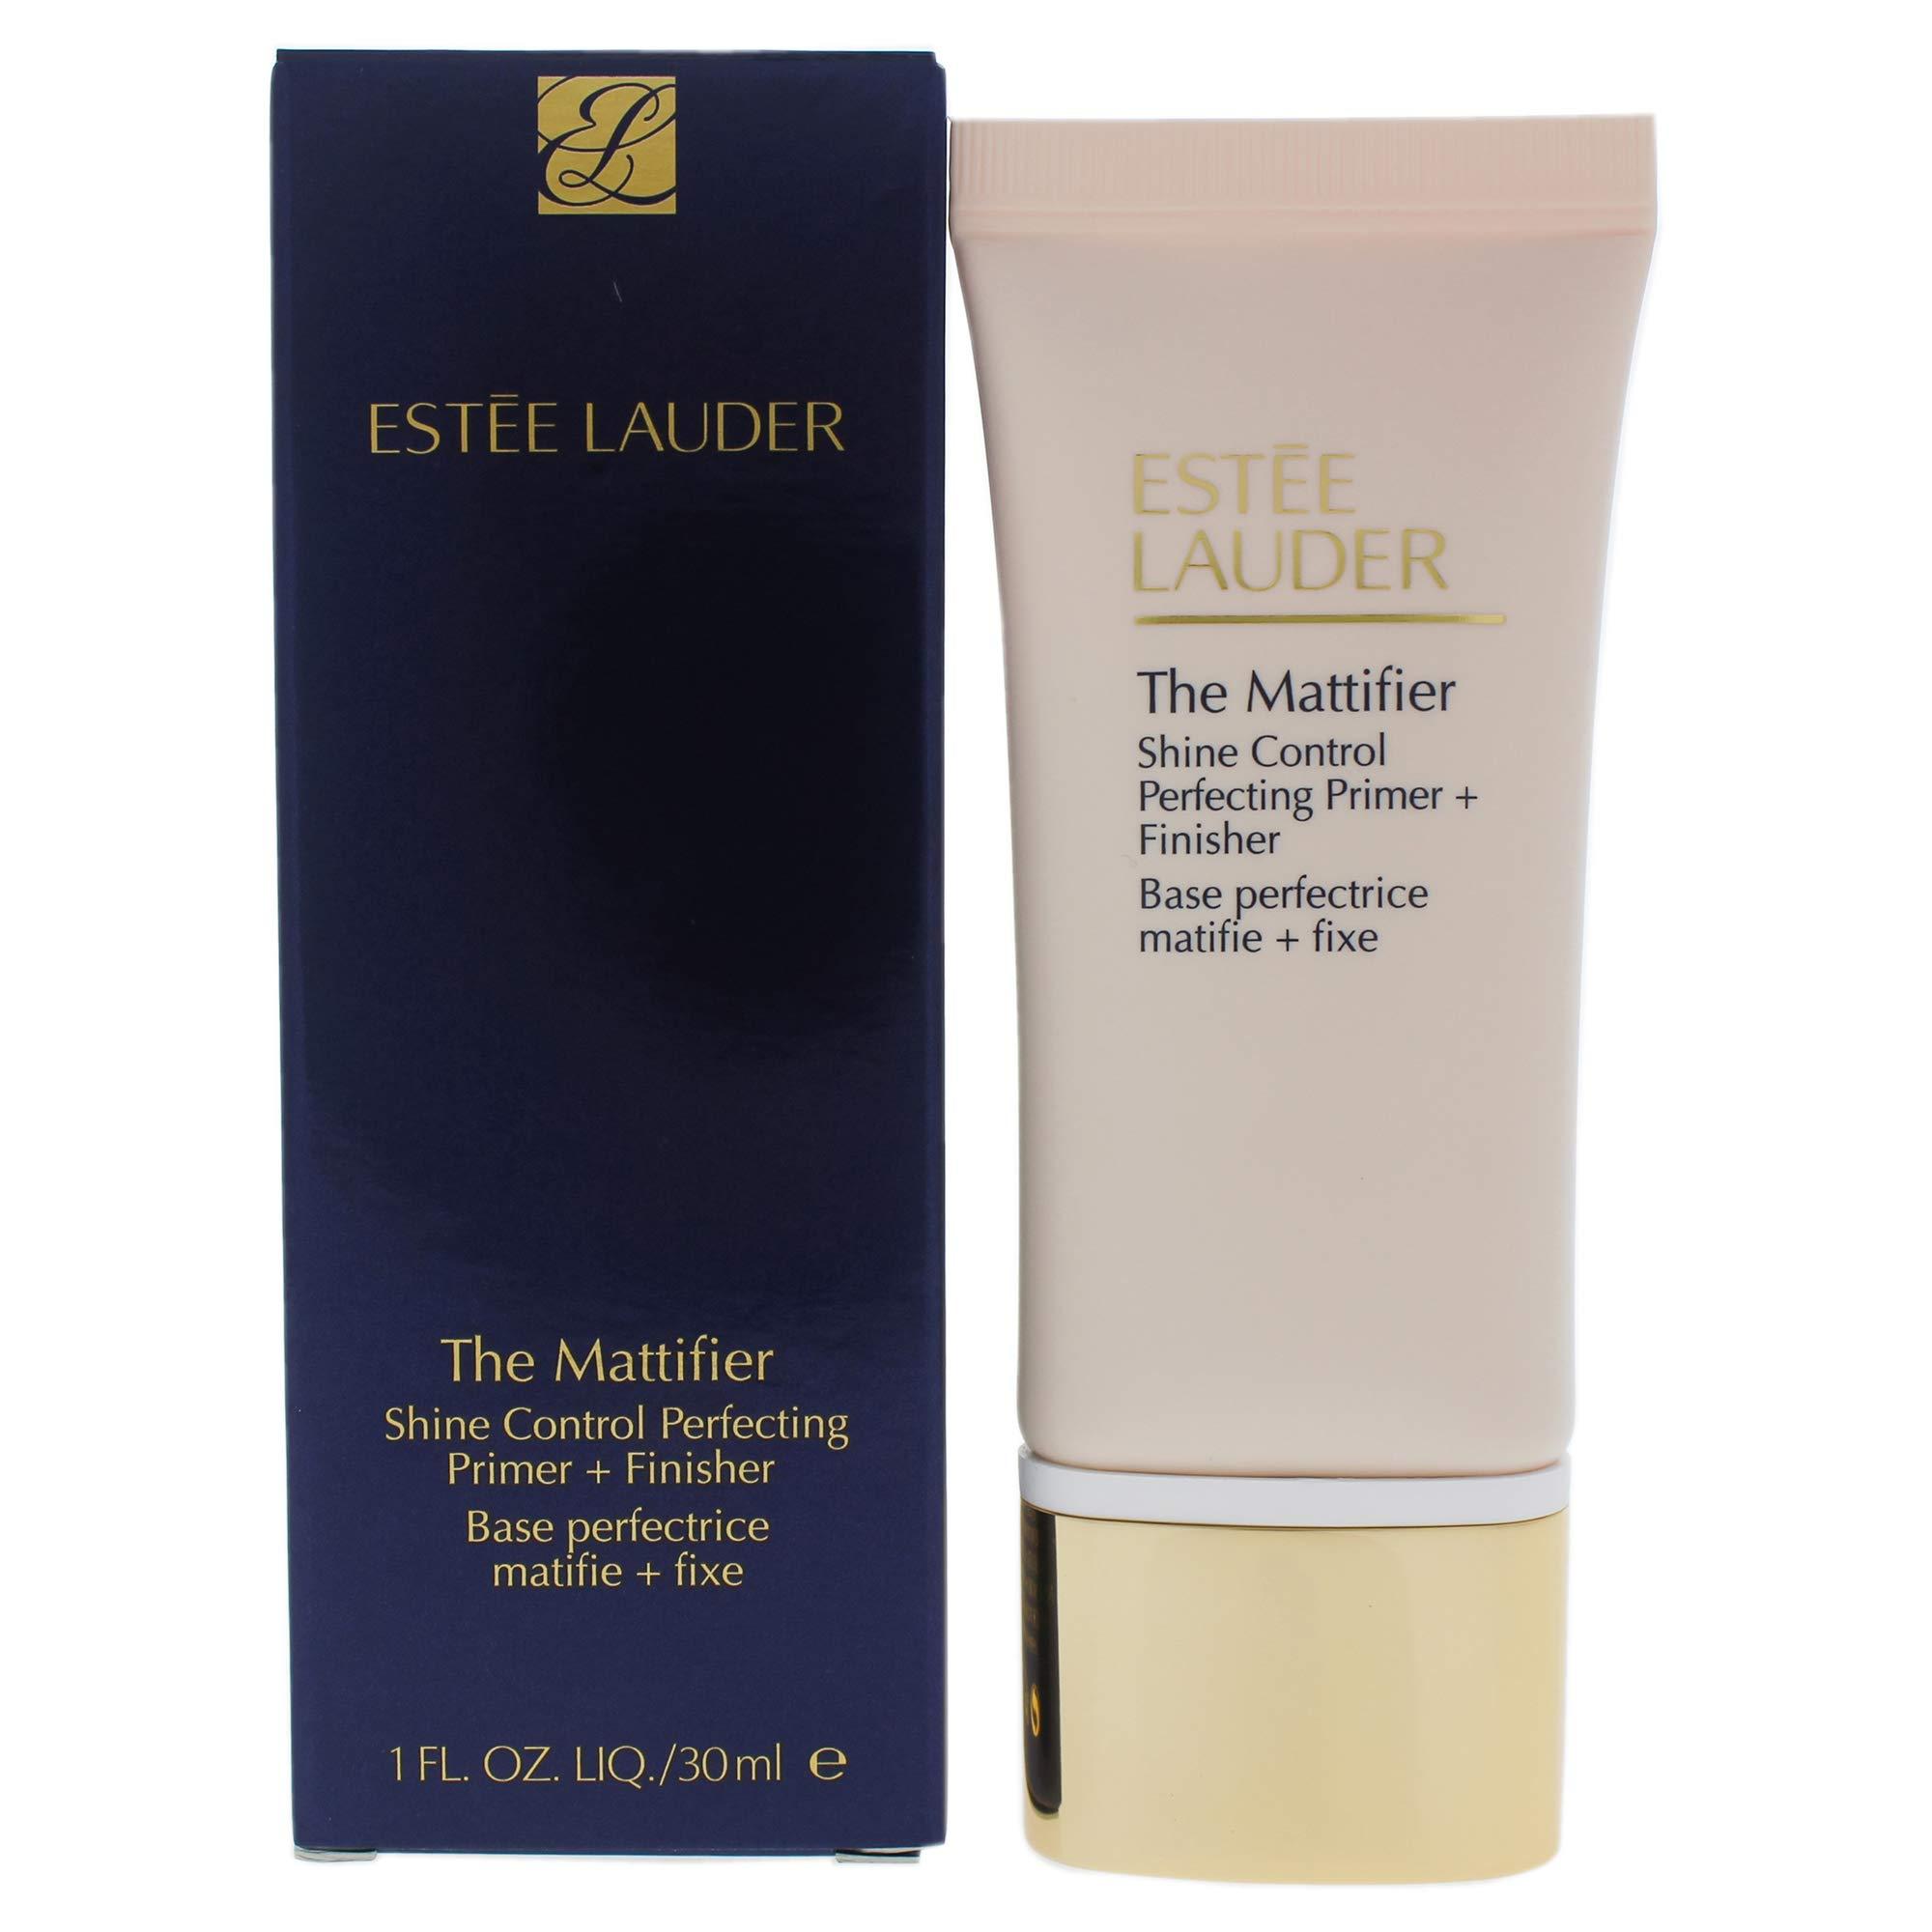 Estee Lauder The Mattifier Shine Control Perfecting Primer + Finisher By Estee Lauder, 1 Ounce by Estee Lauder